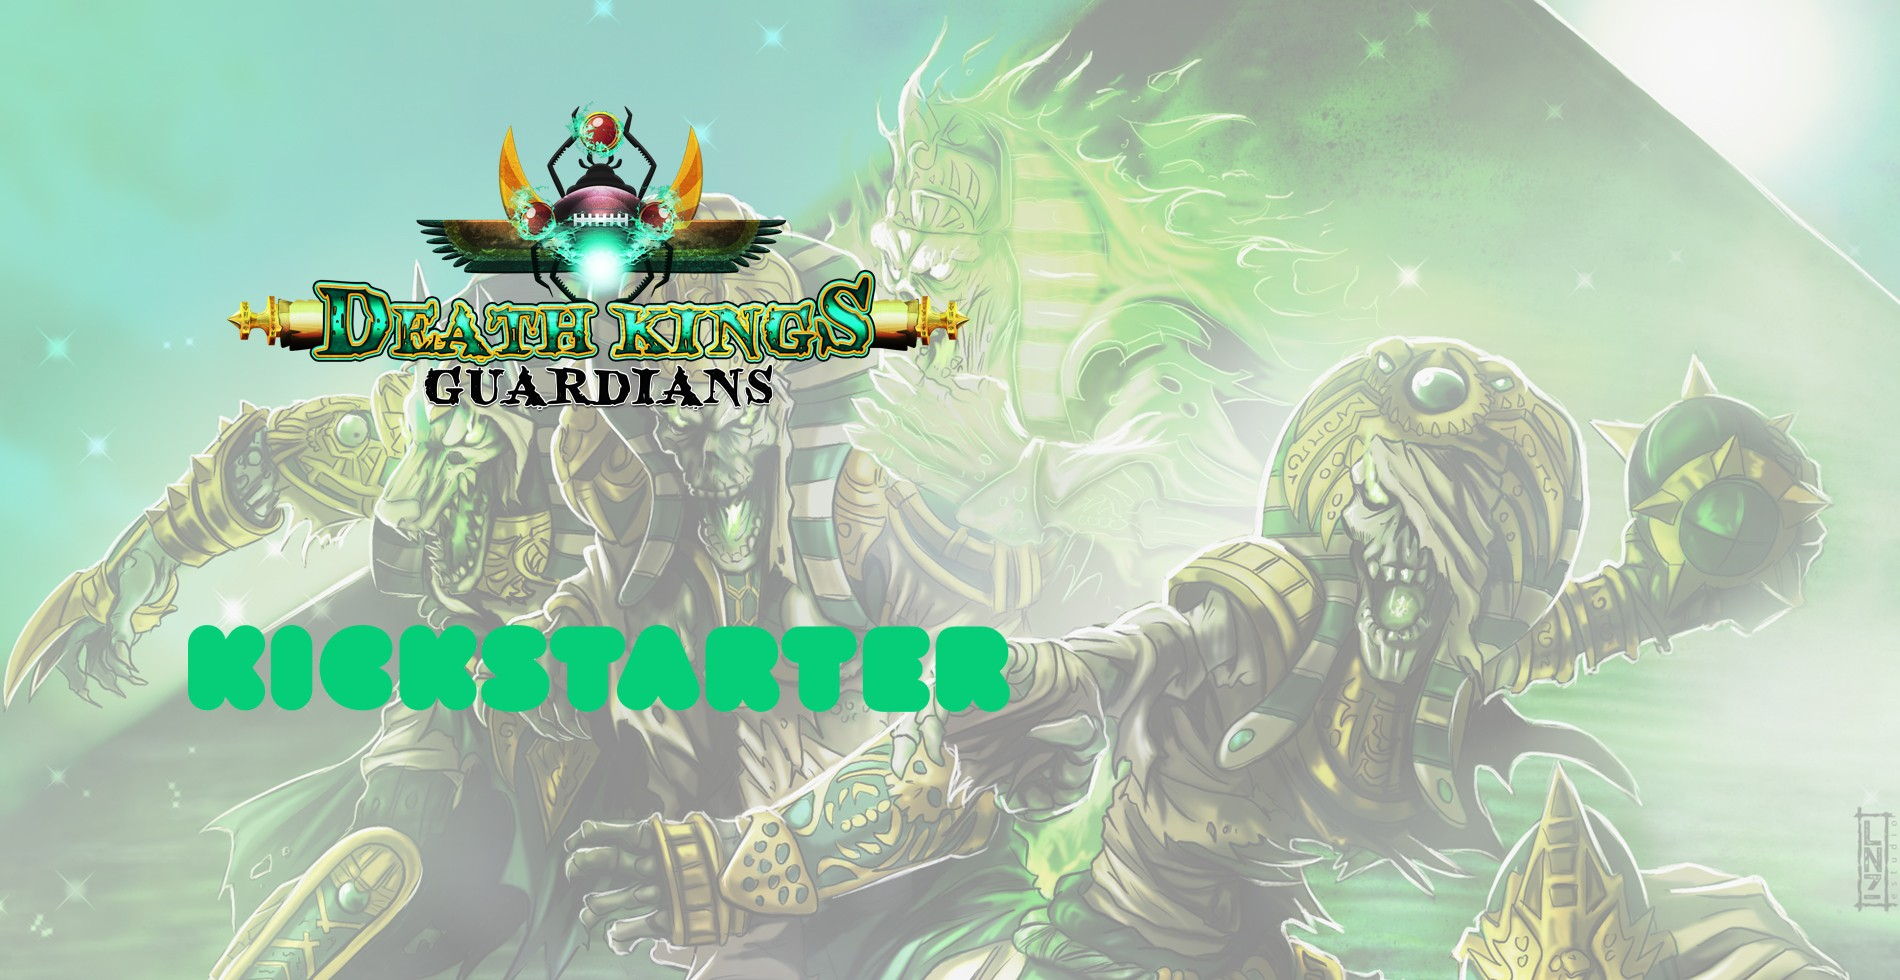 Death Kings Guardians